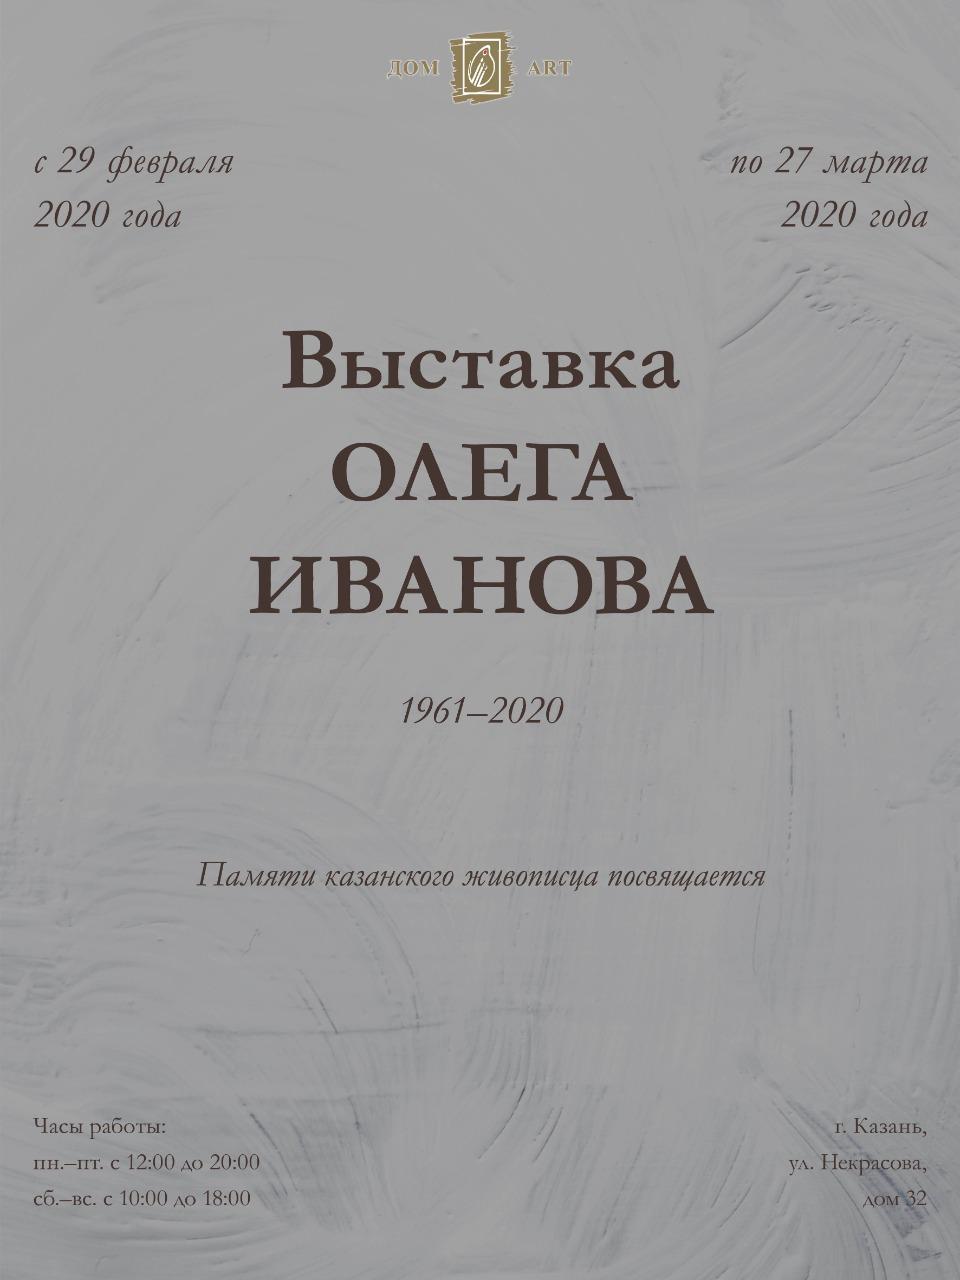 Exhibition of paintings by Kazan artist Oleg Ivanov